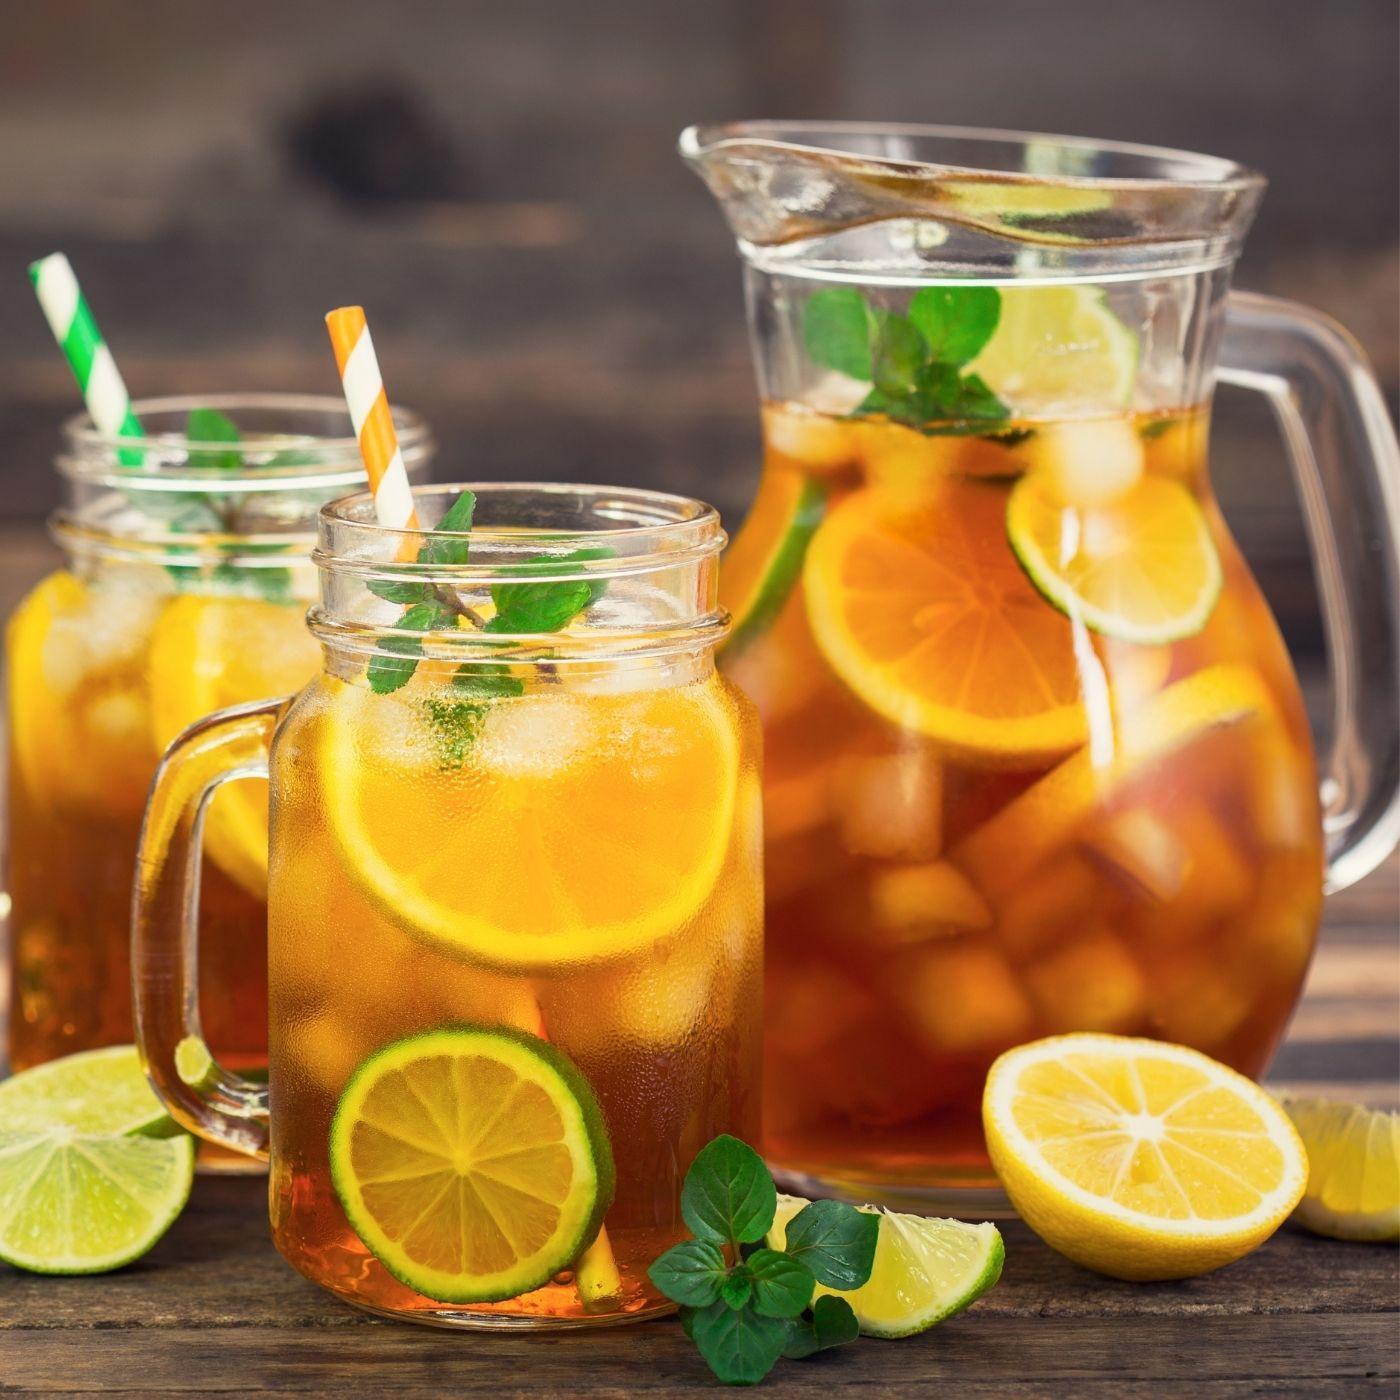 How to Make Southern Sweet Tea?